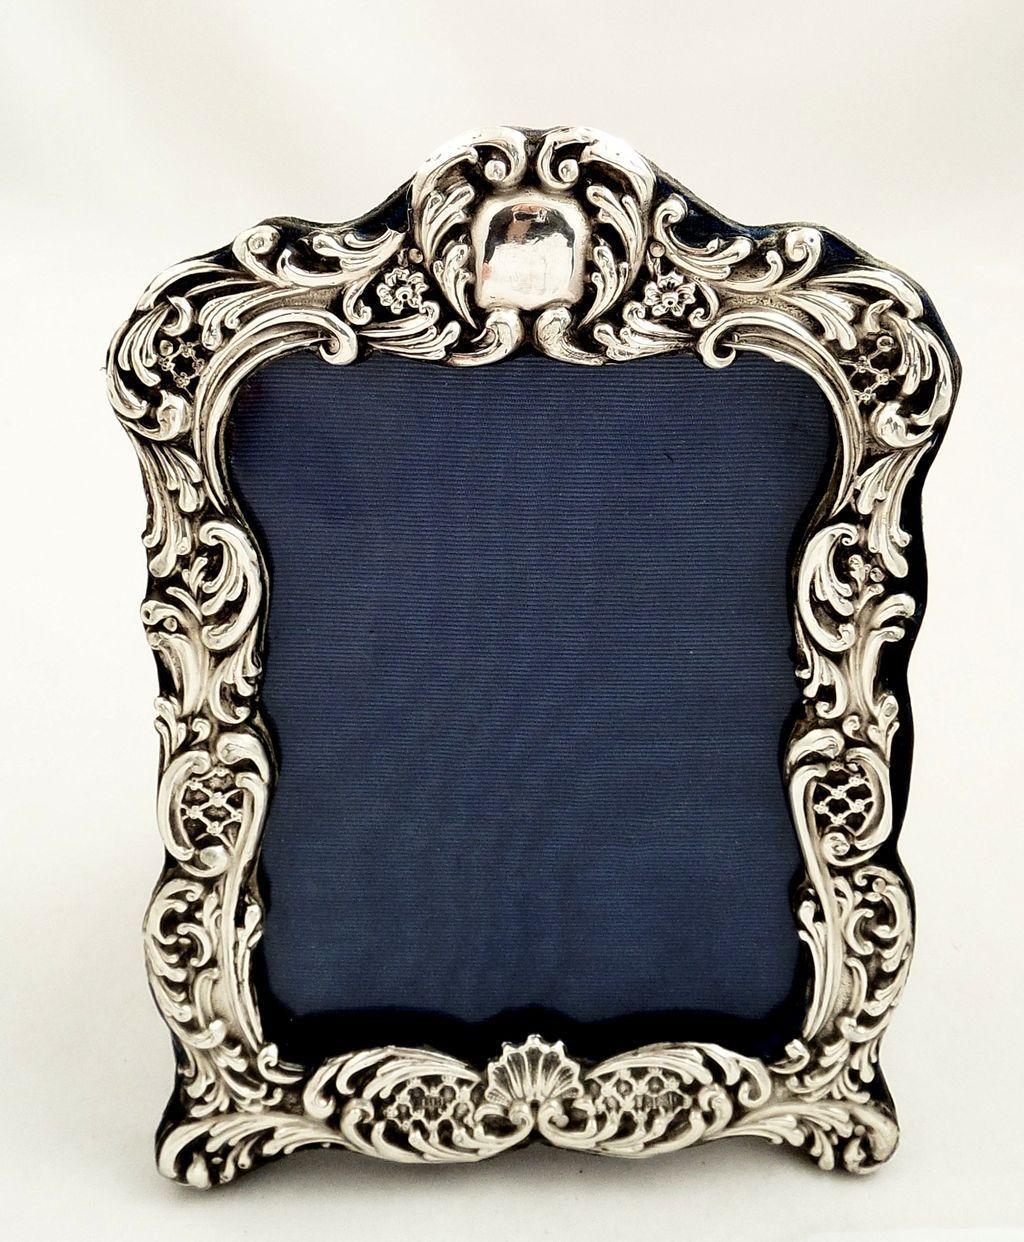 816df4d5bdc Antique Edwardian Sterling Silver Photo Frame 1902